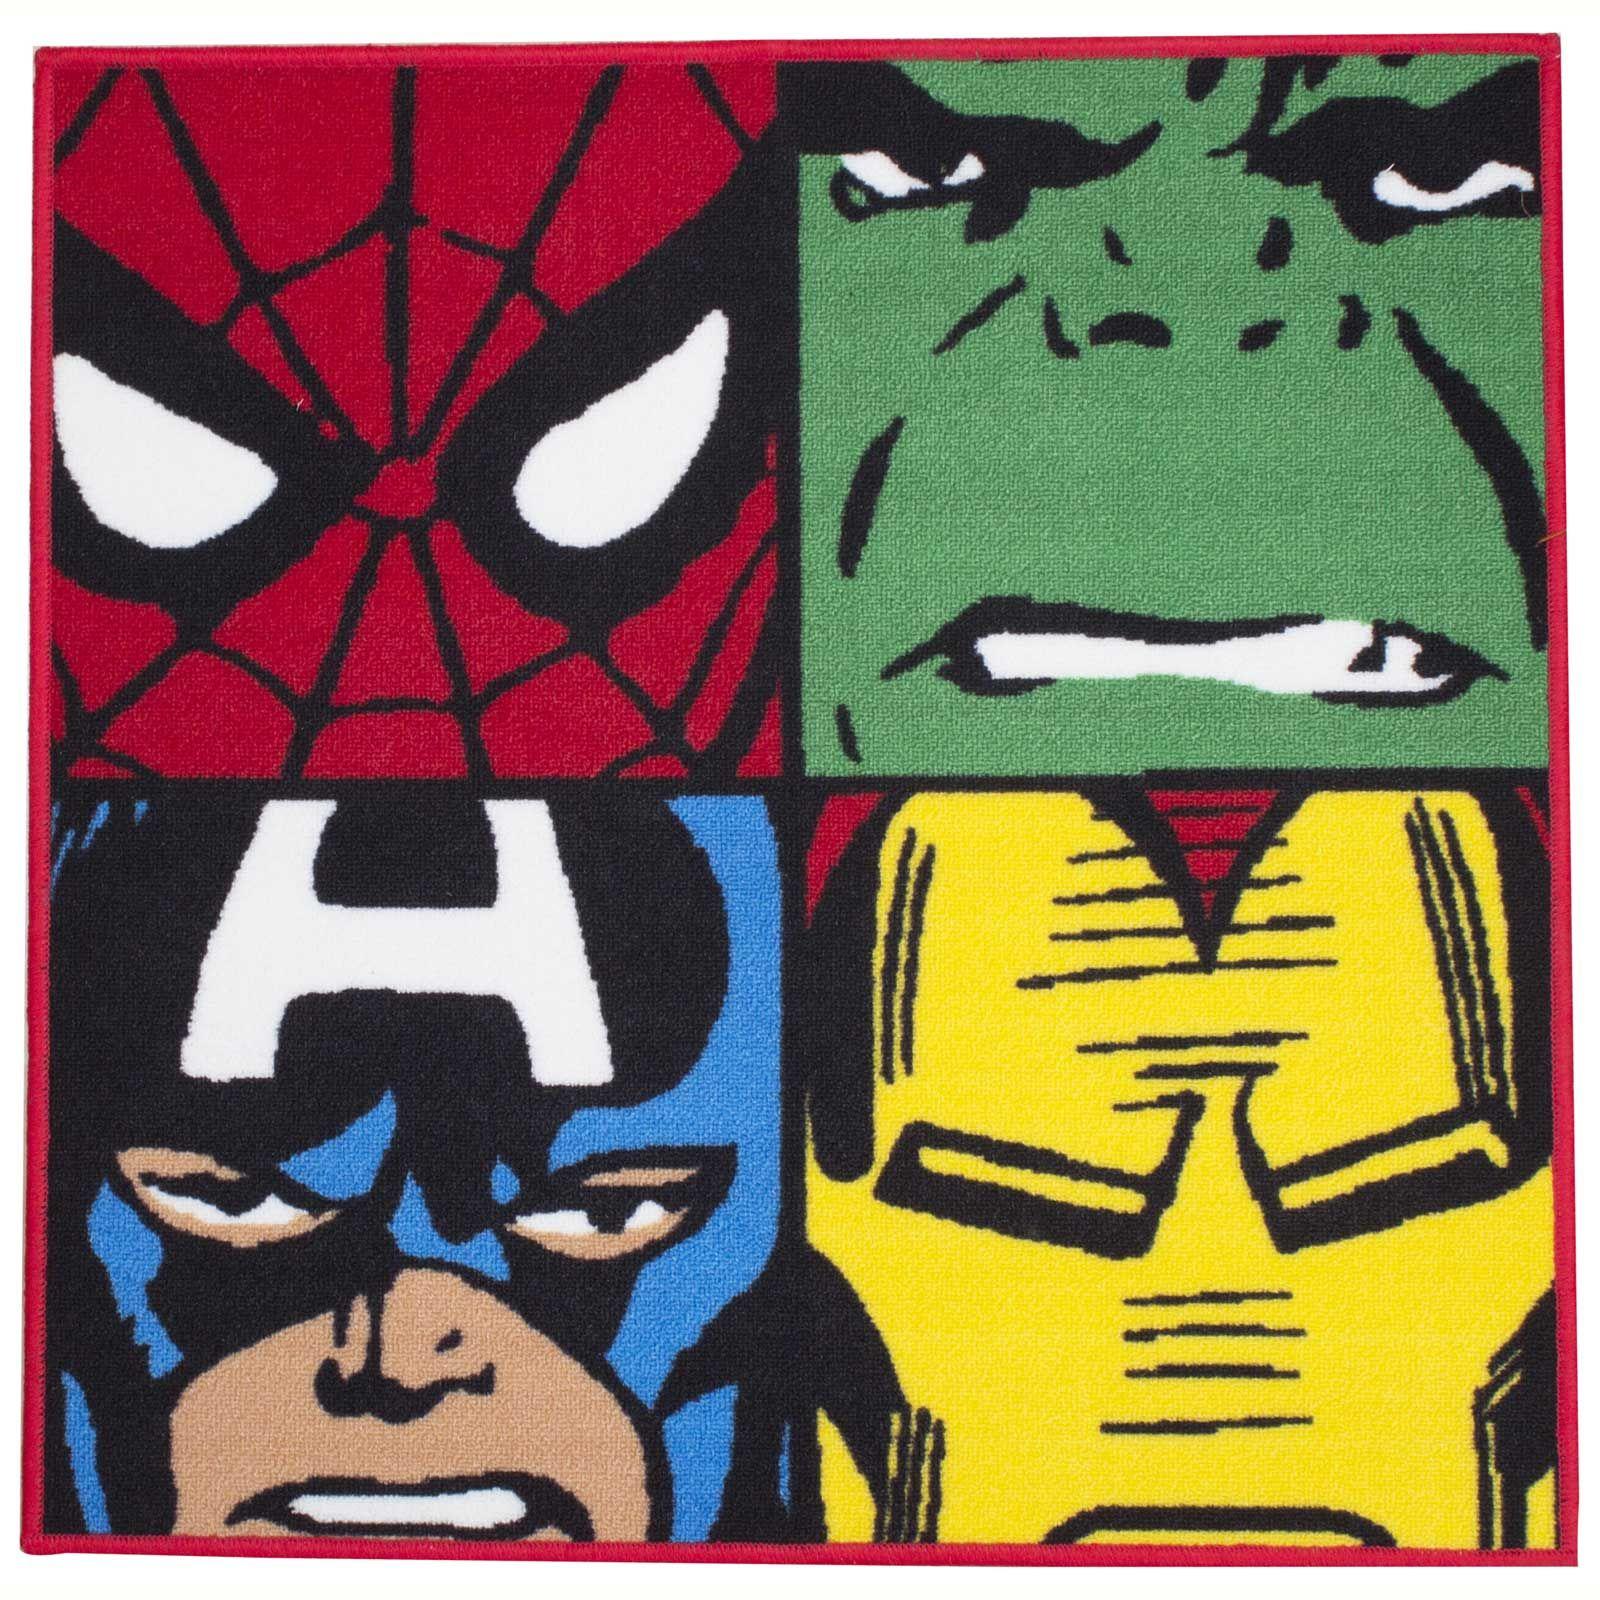 Ufficiale-Disney-amp-Character-Pavimento-Tappeti-Avengers-Batman-Pokemon-Frozen